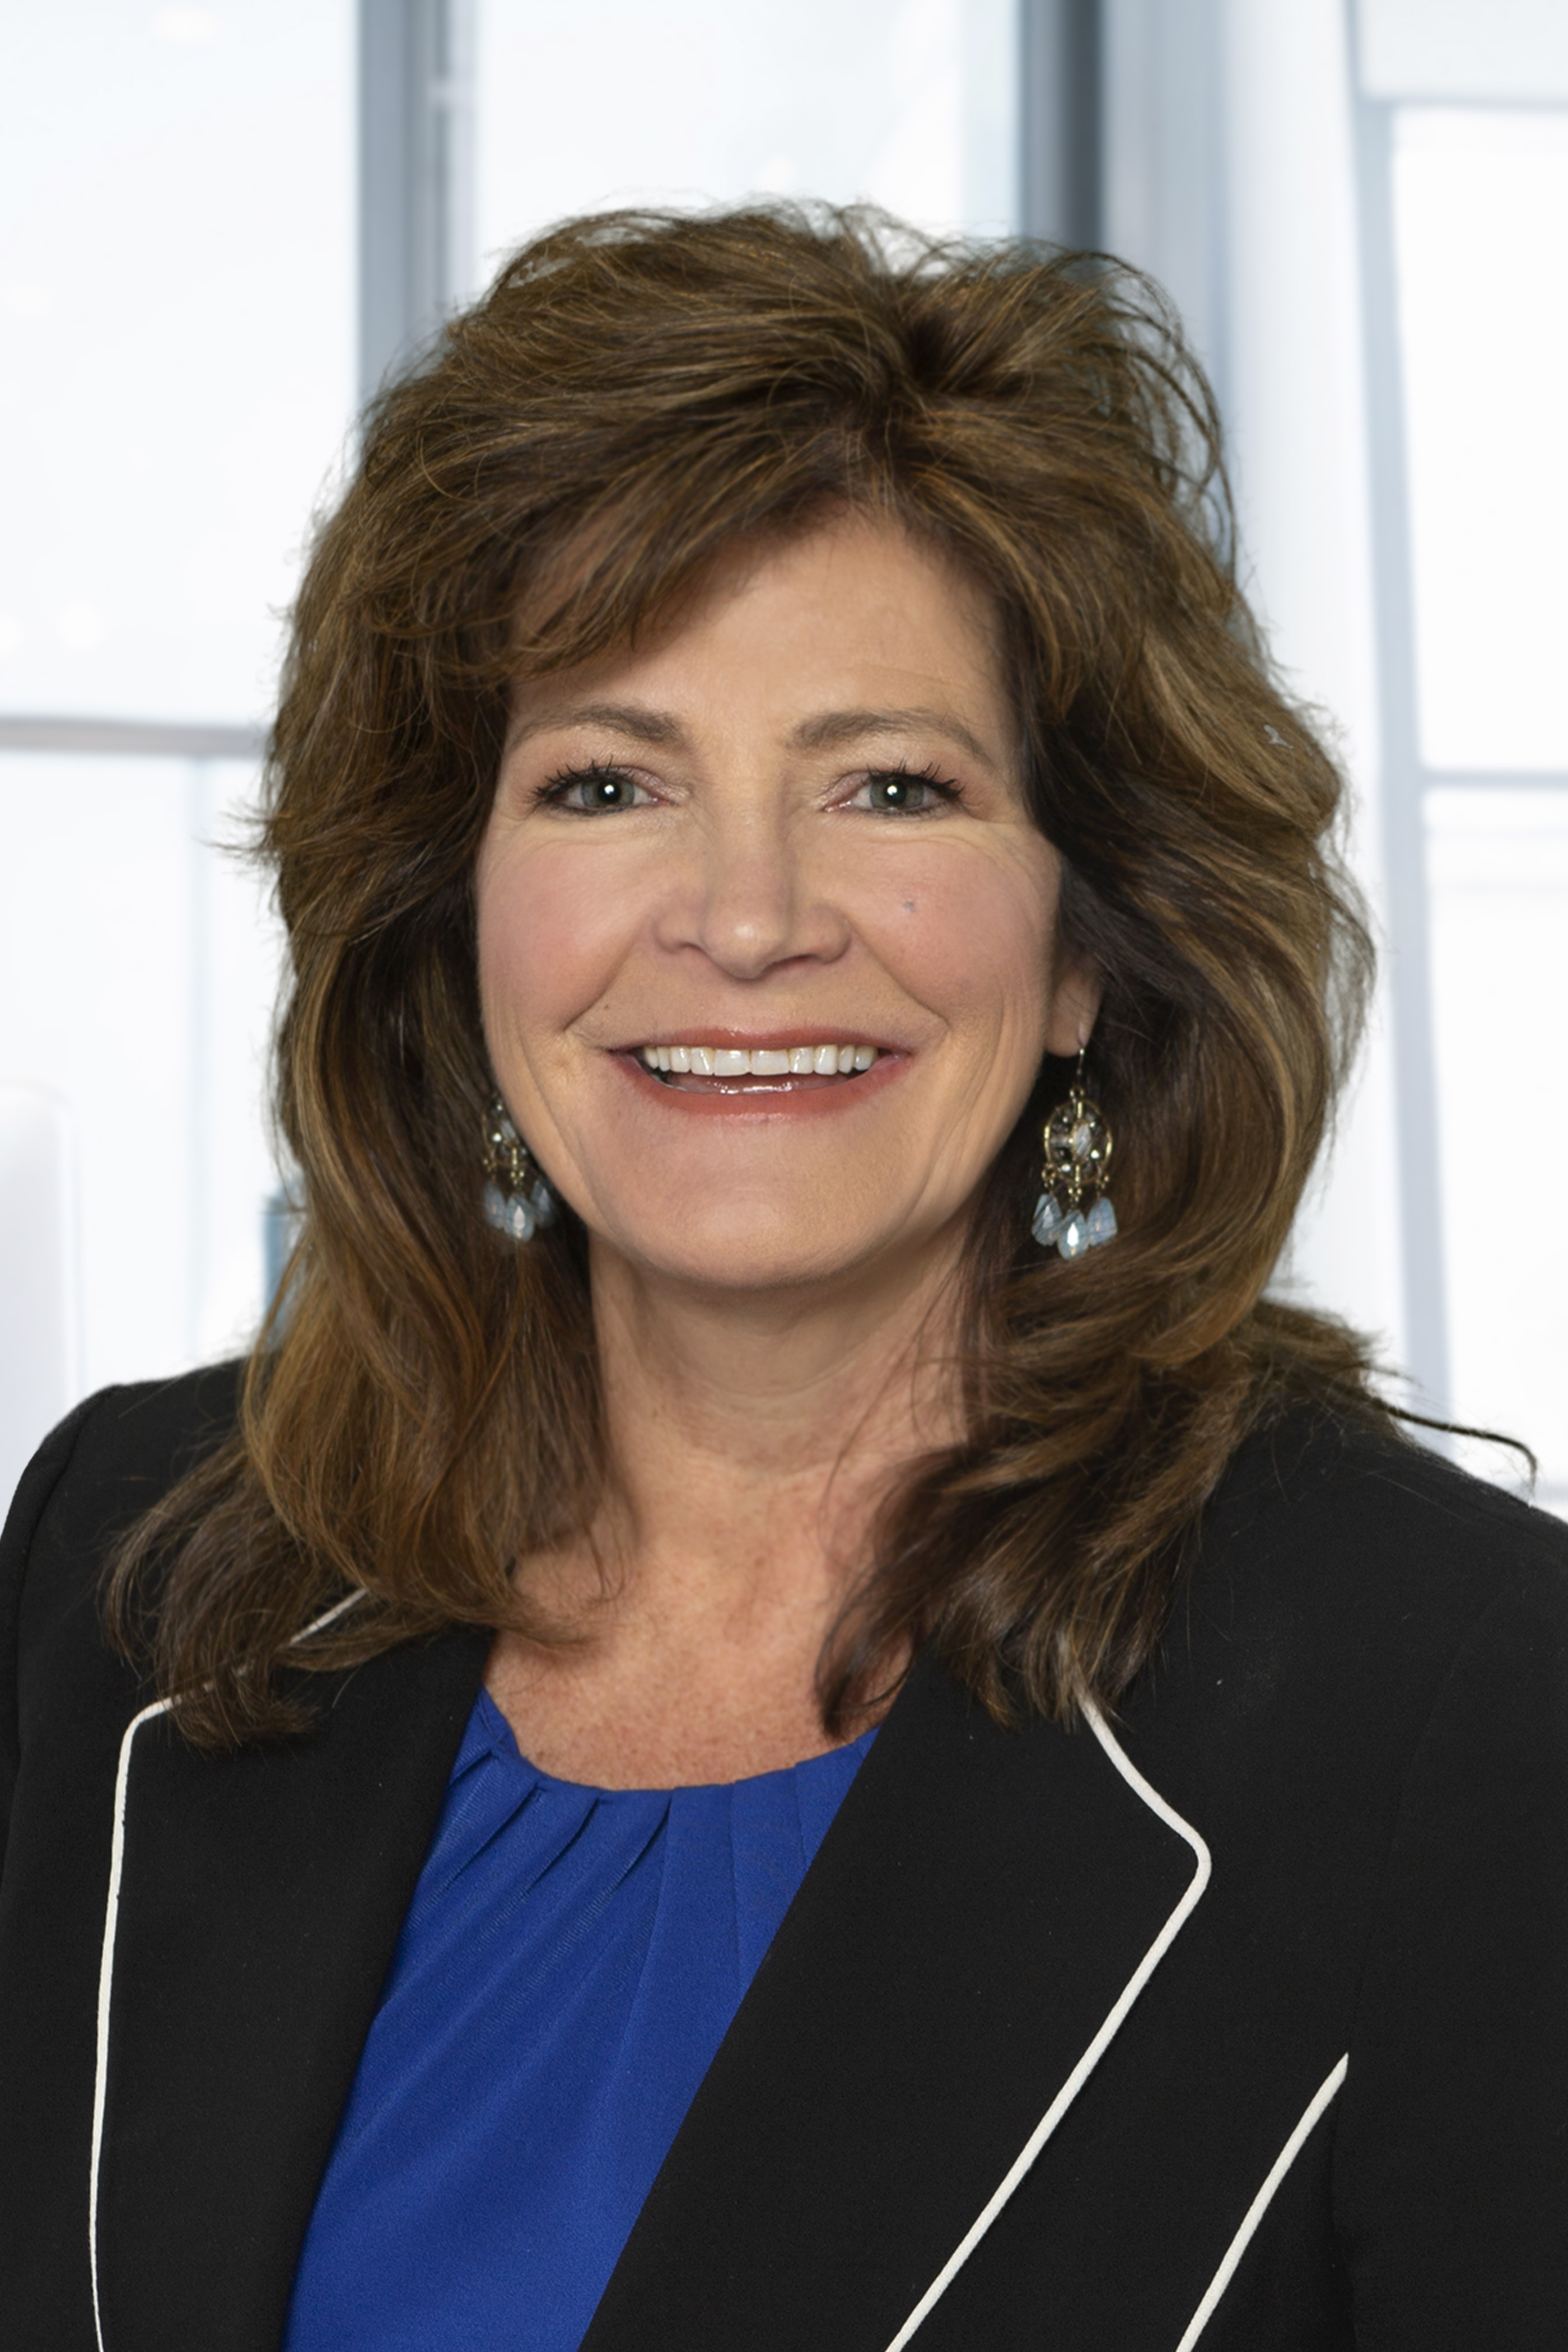 Cindy P. Blyle